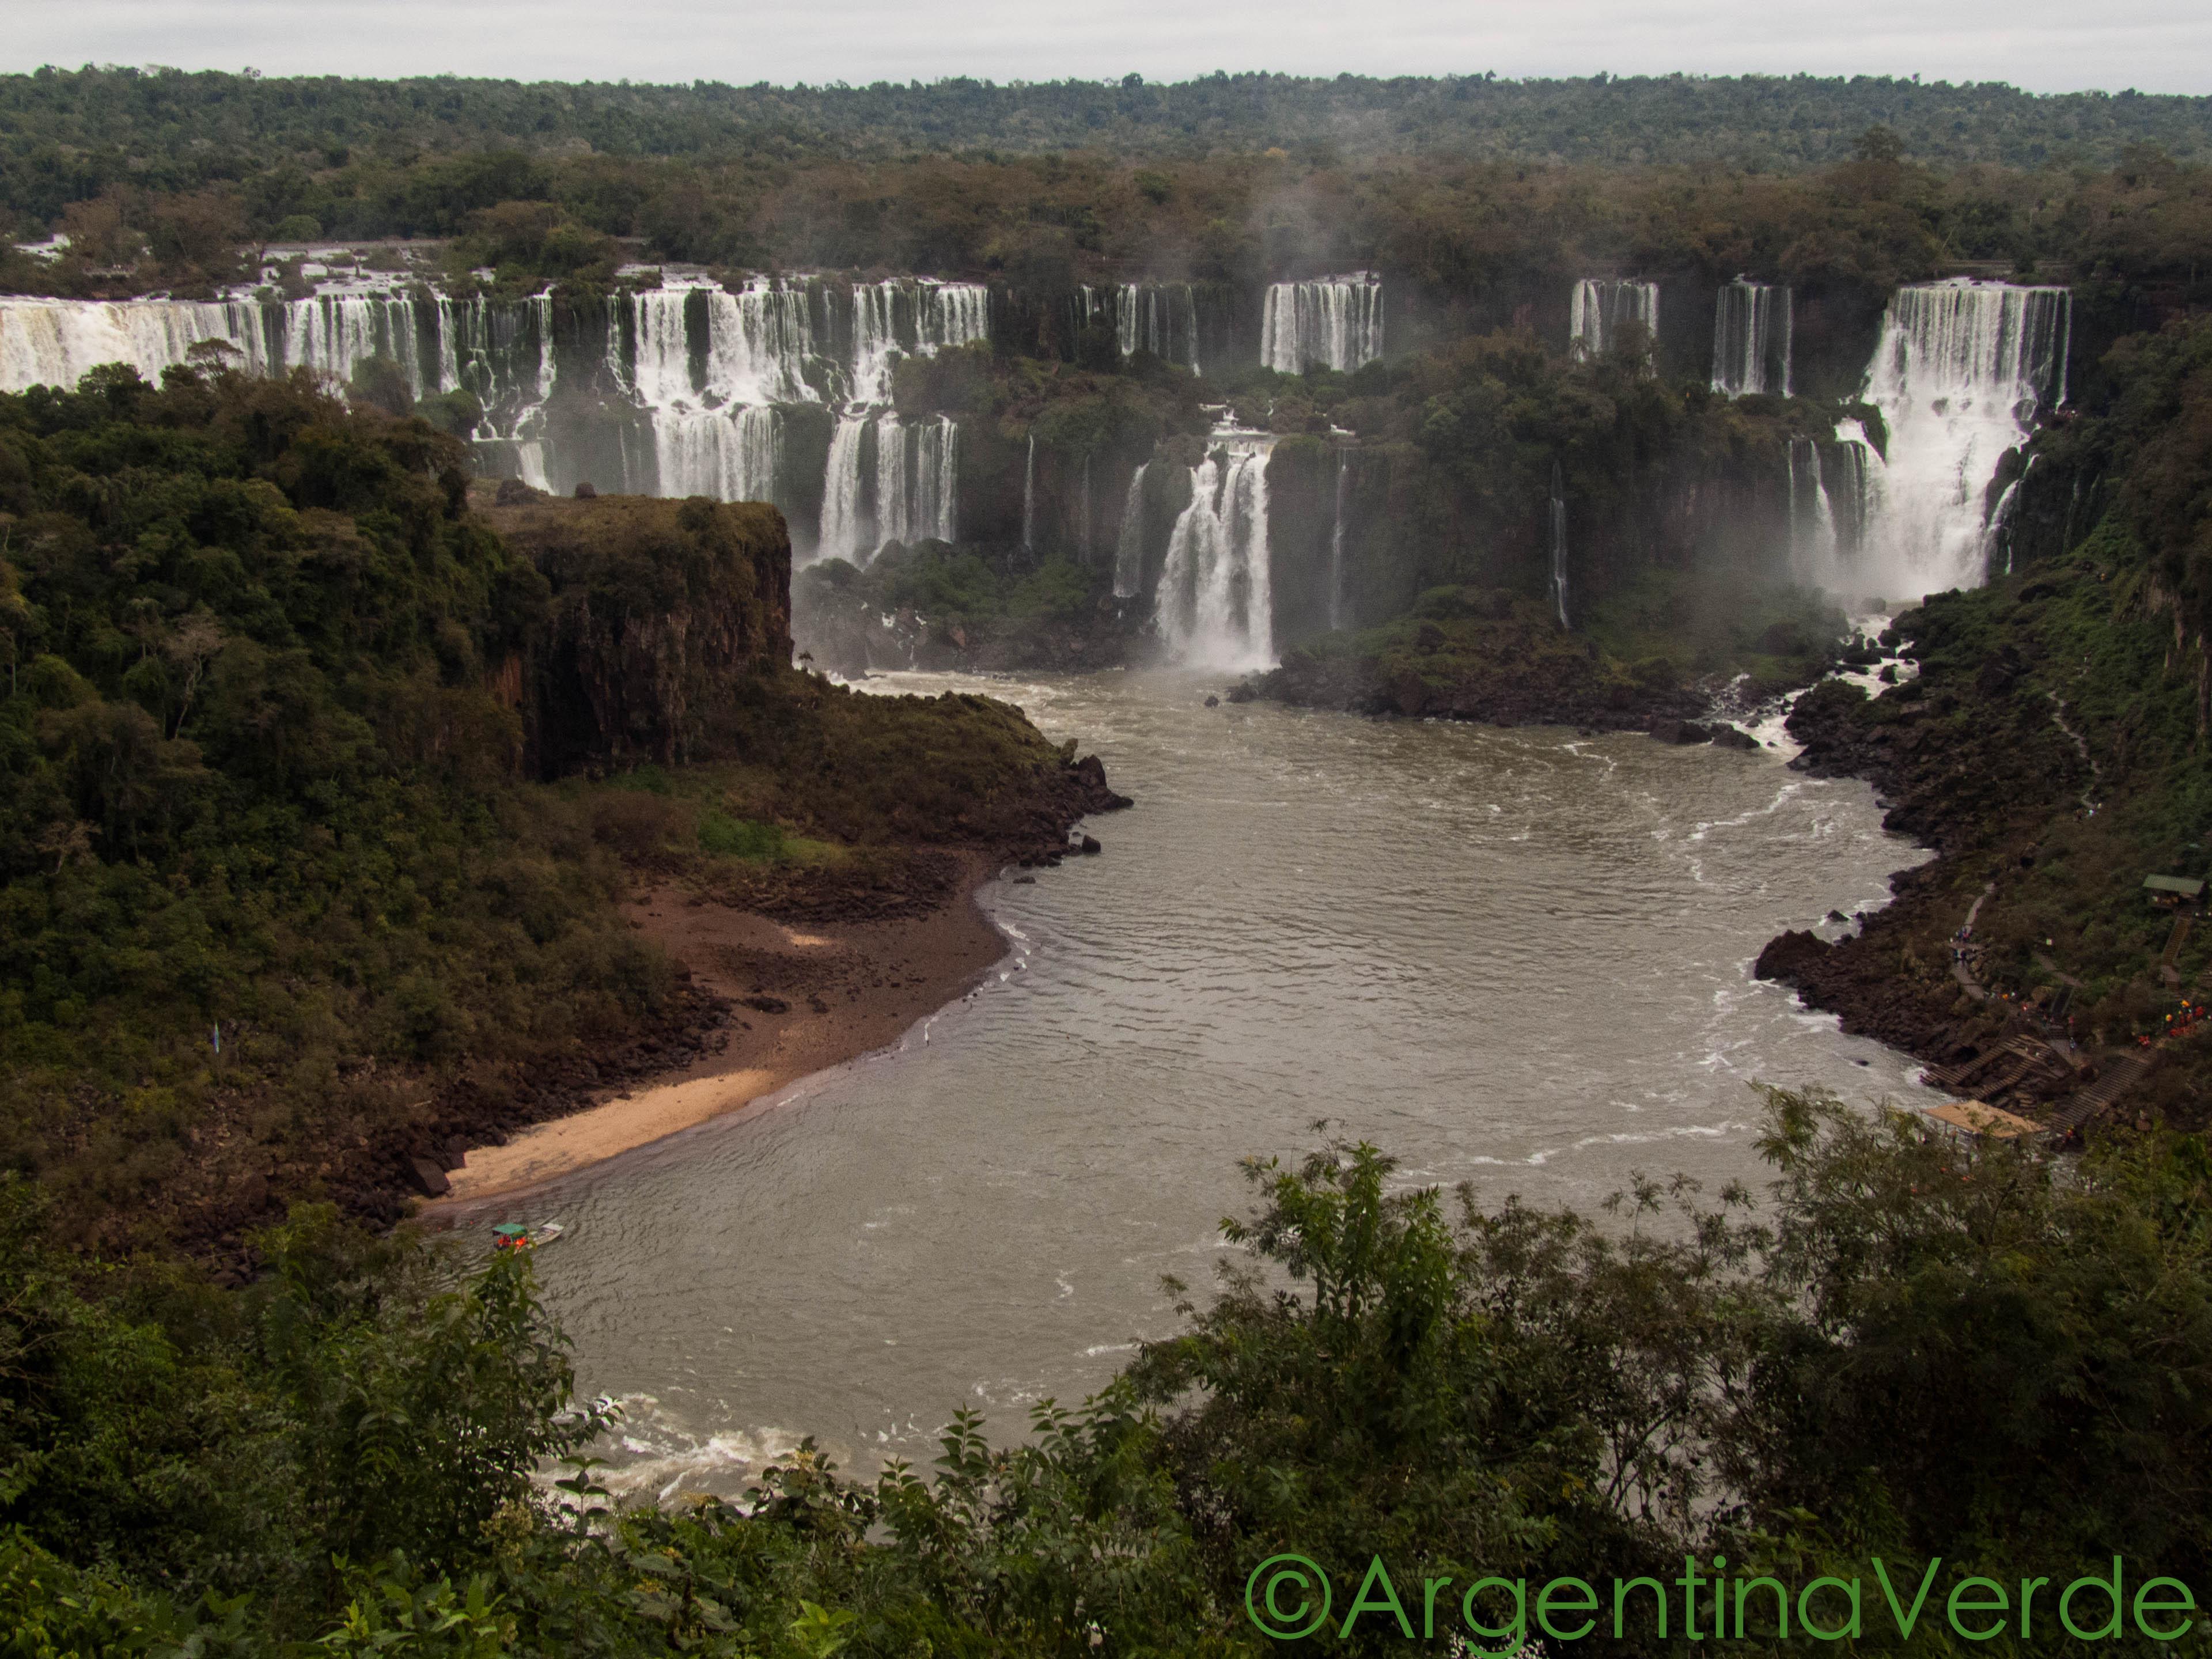 Road trip in Argentina